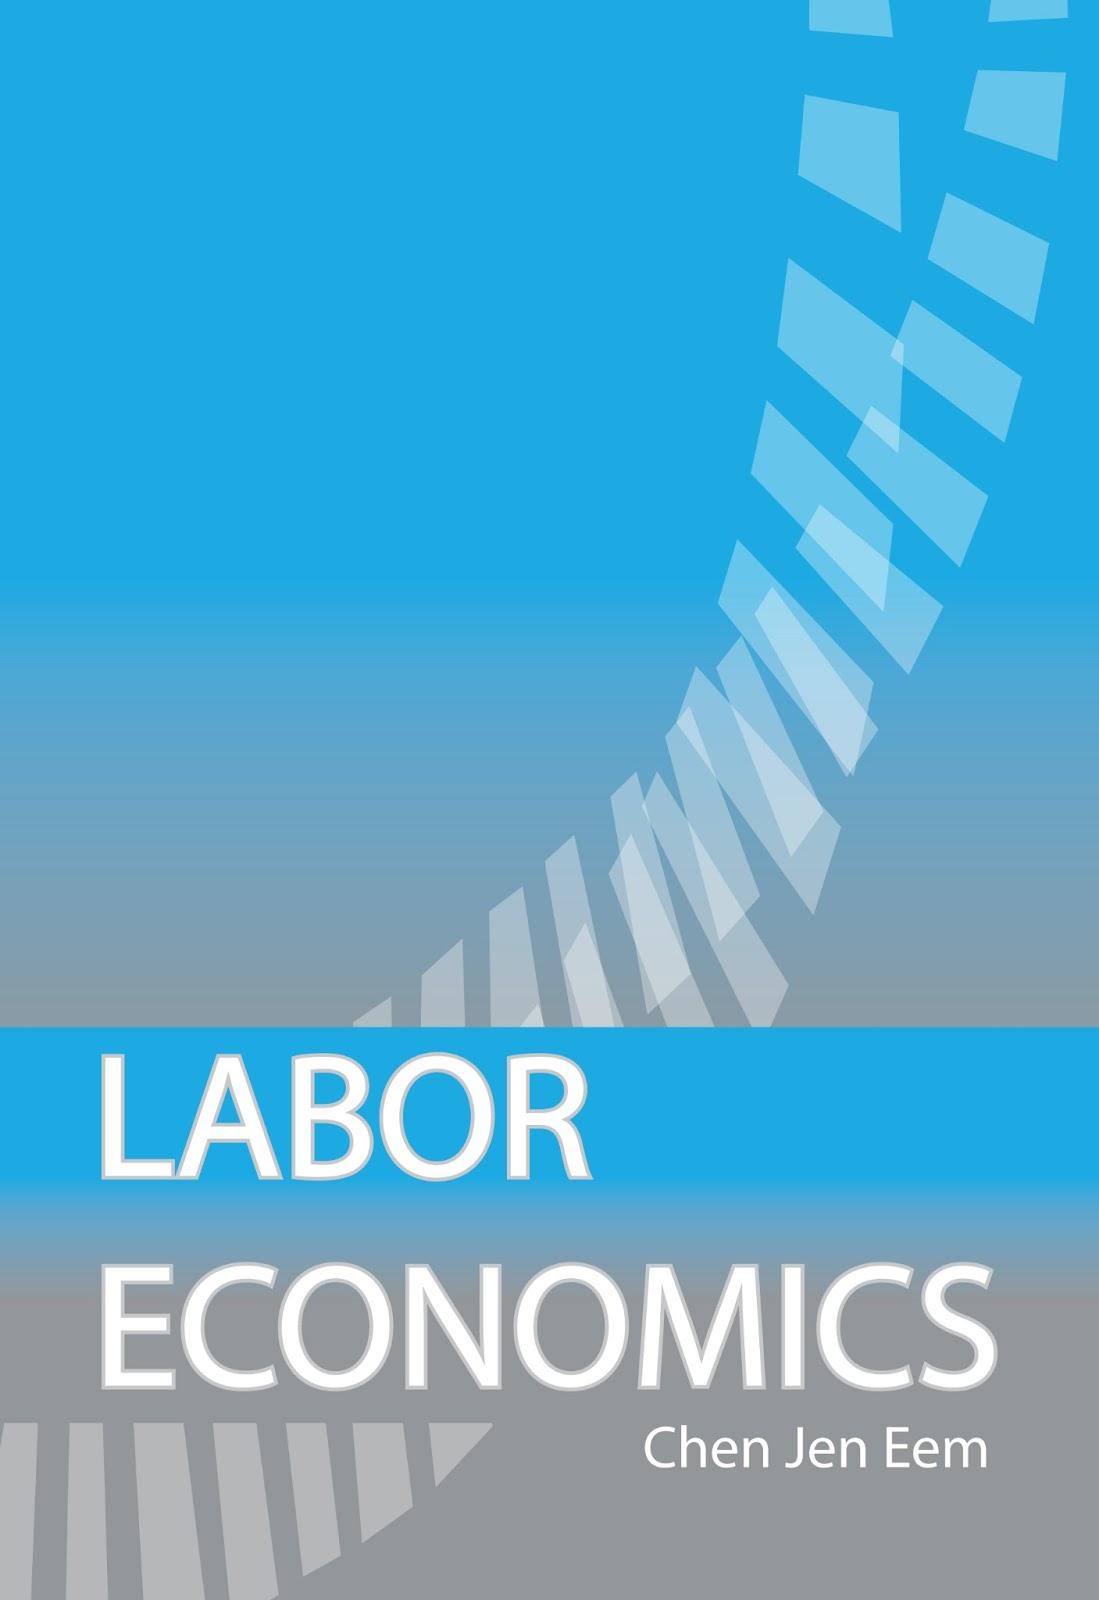 Readings Labor Economics Industrial Relations